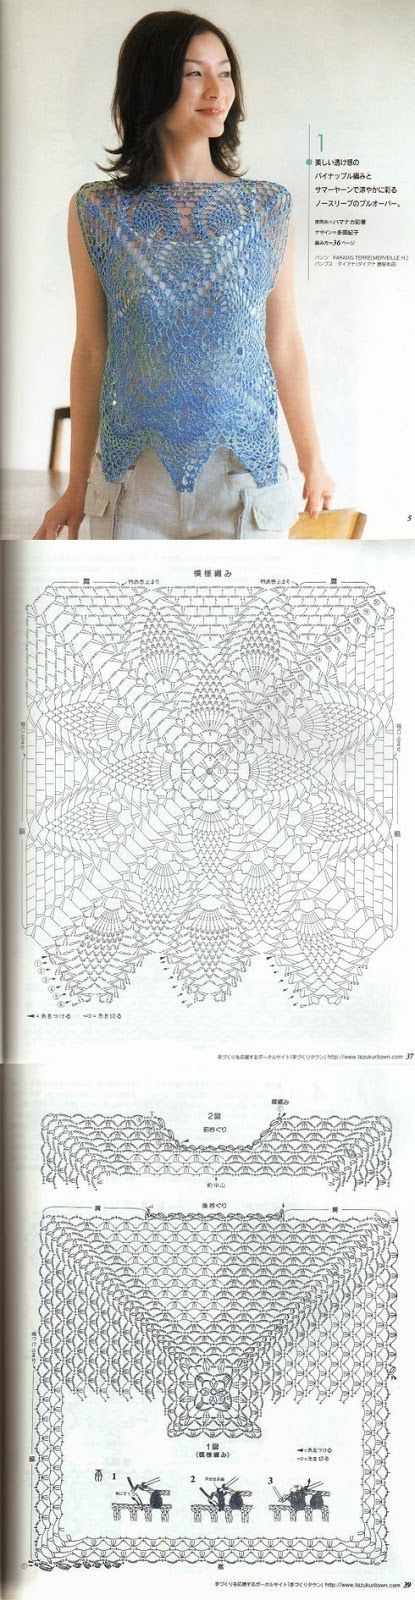 blusa42.jpg (415×1600)